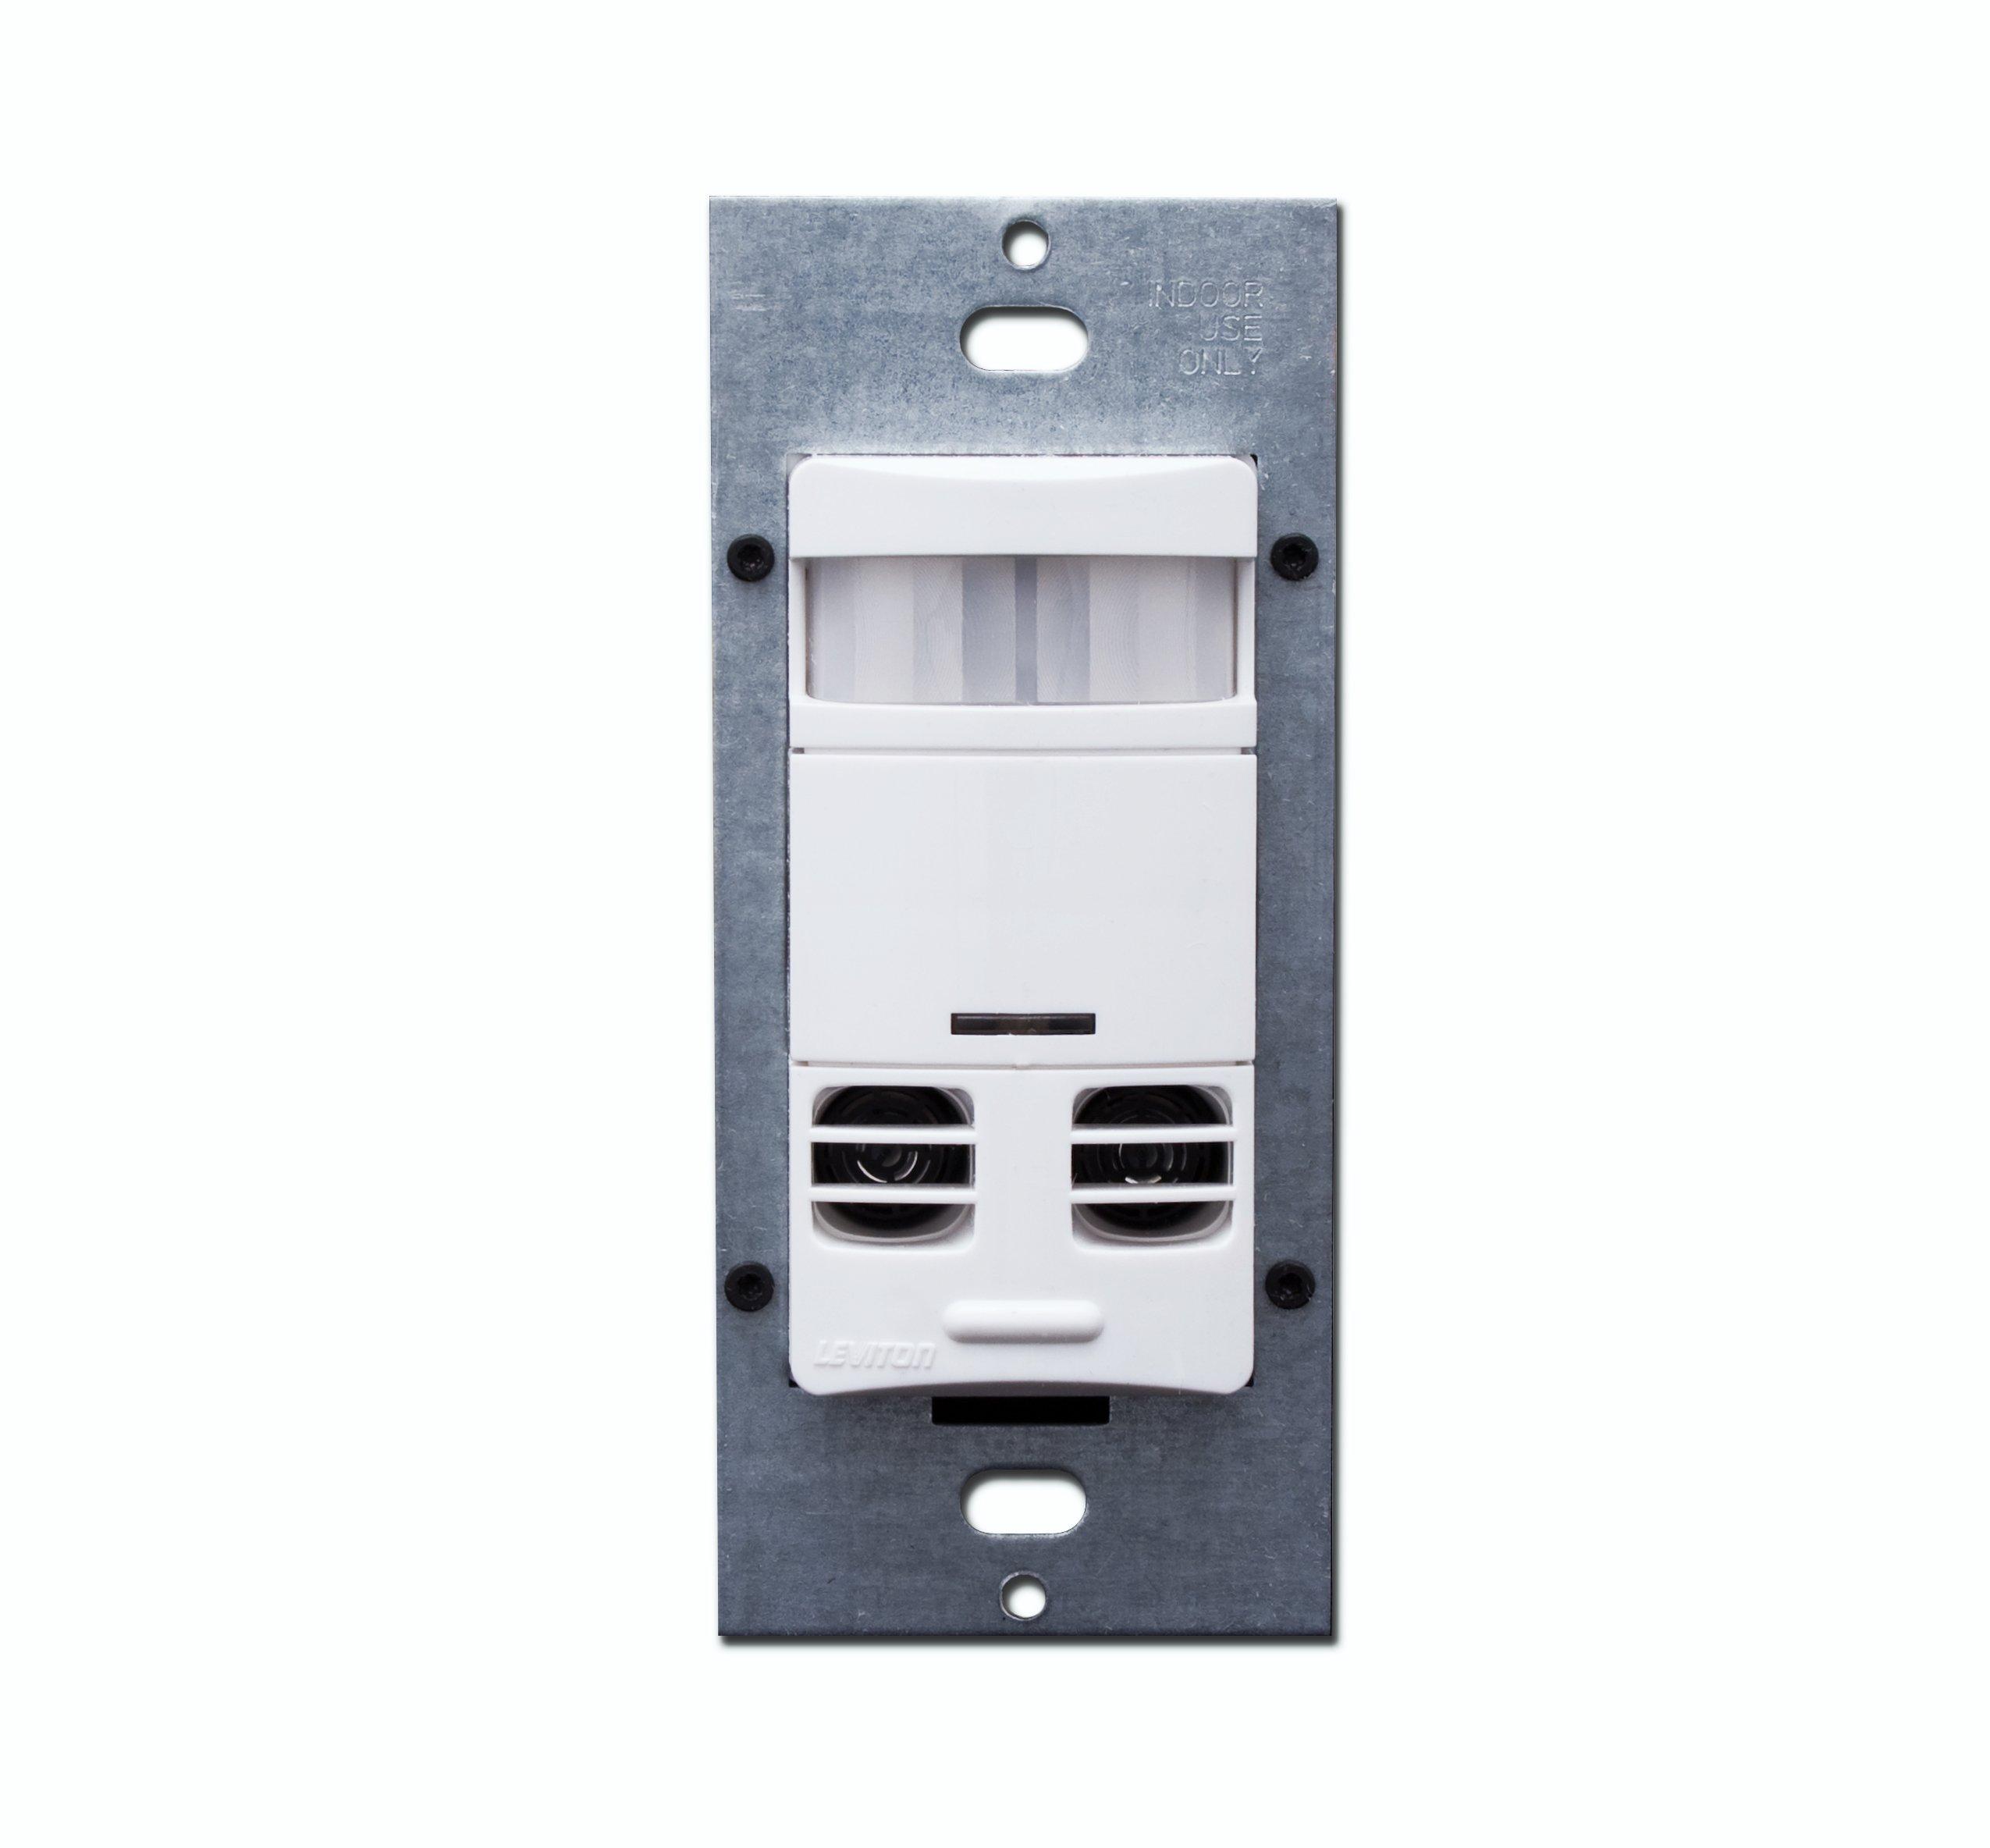 Leviton OSSMT-MDW Ultrasonic/Infrared Wall Switch Sensor, White by Leviton (Image #1)